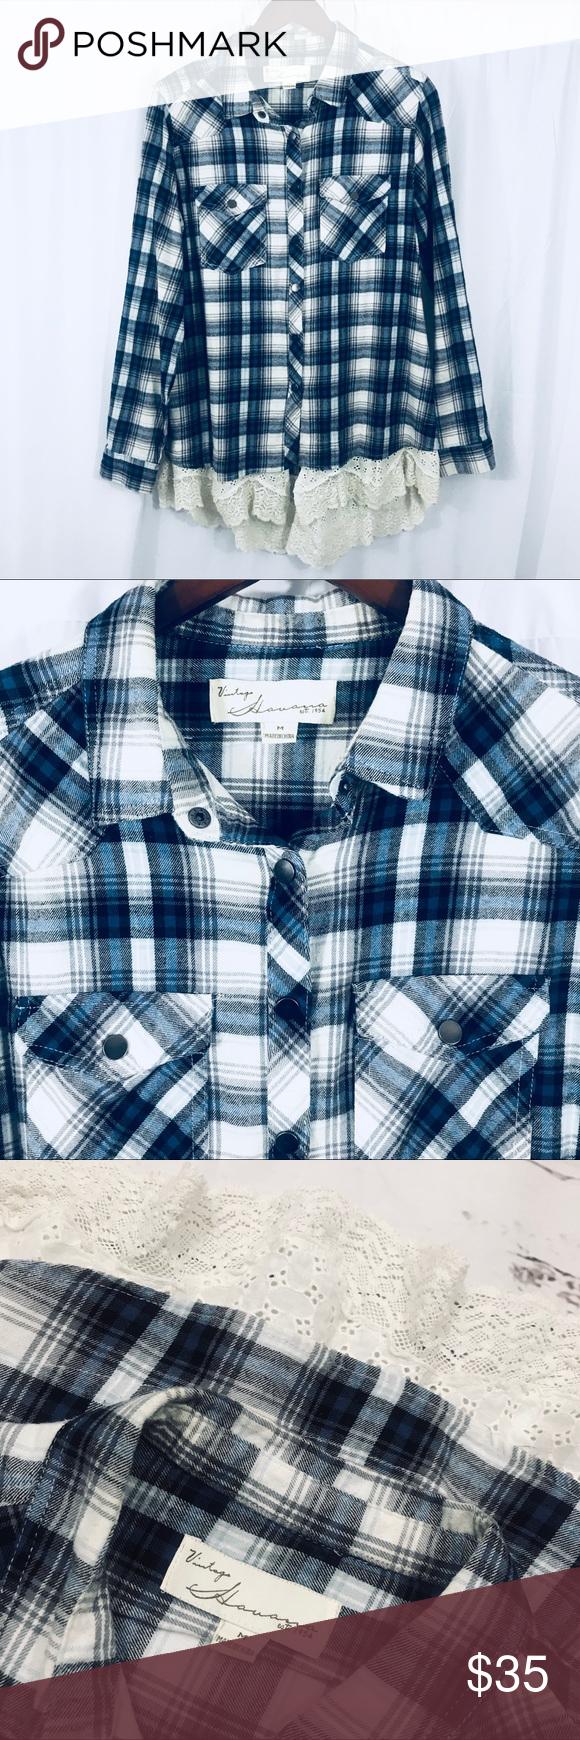 Mandarin collar flannel  Blue plaid high low lace flannel shirt medium  Blue plaid Flannel